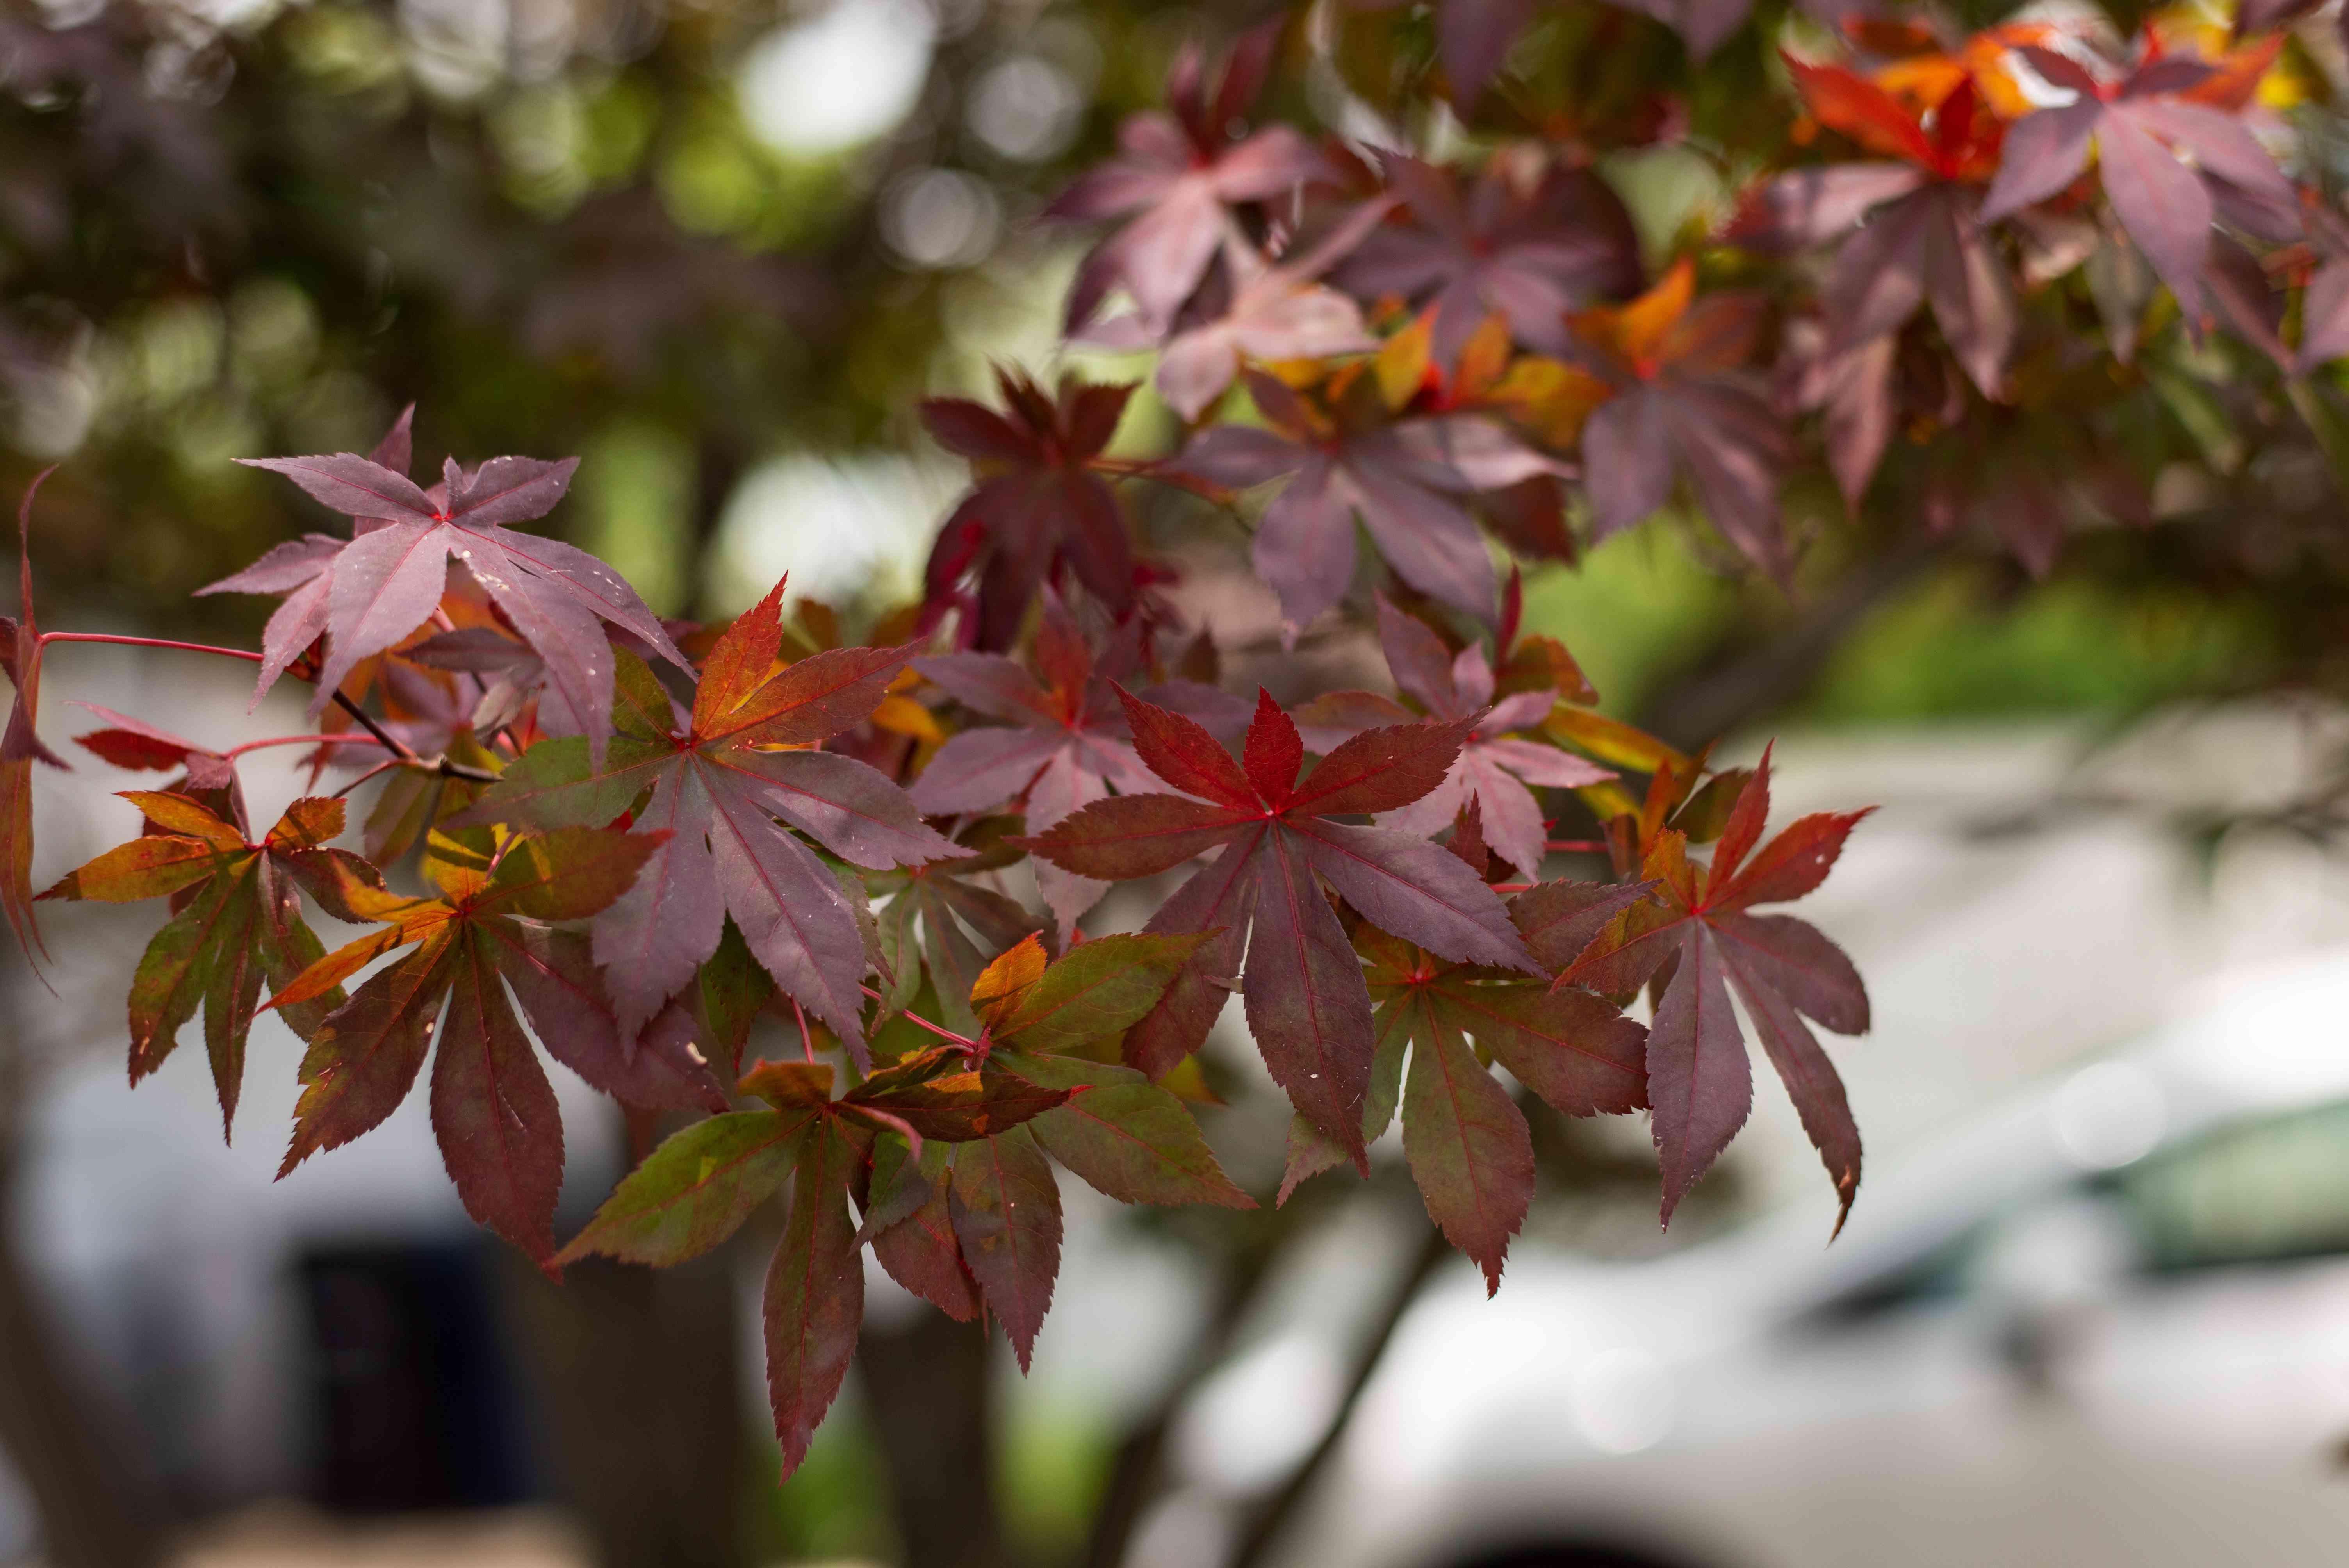 Japanese maple 'Bloodgood' tree with reddish-purple leaves on branch